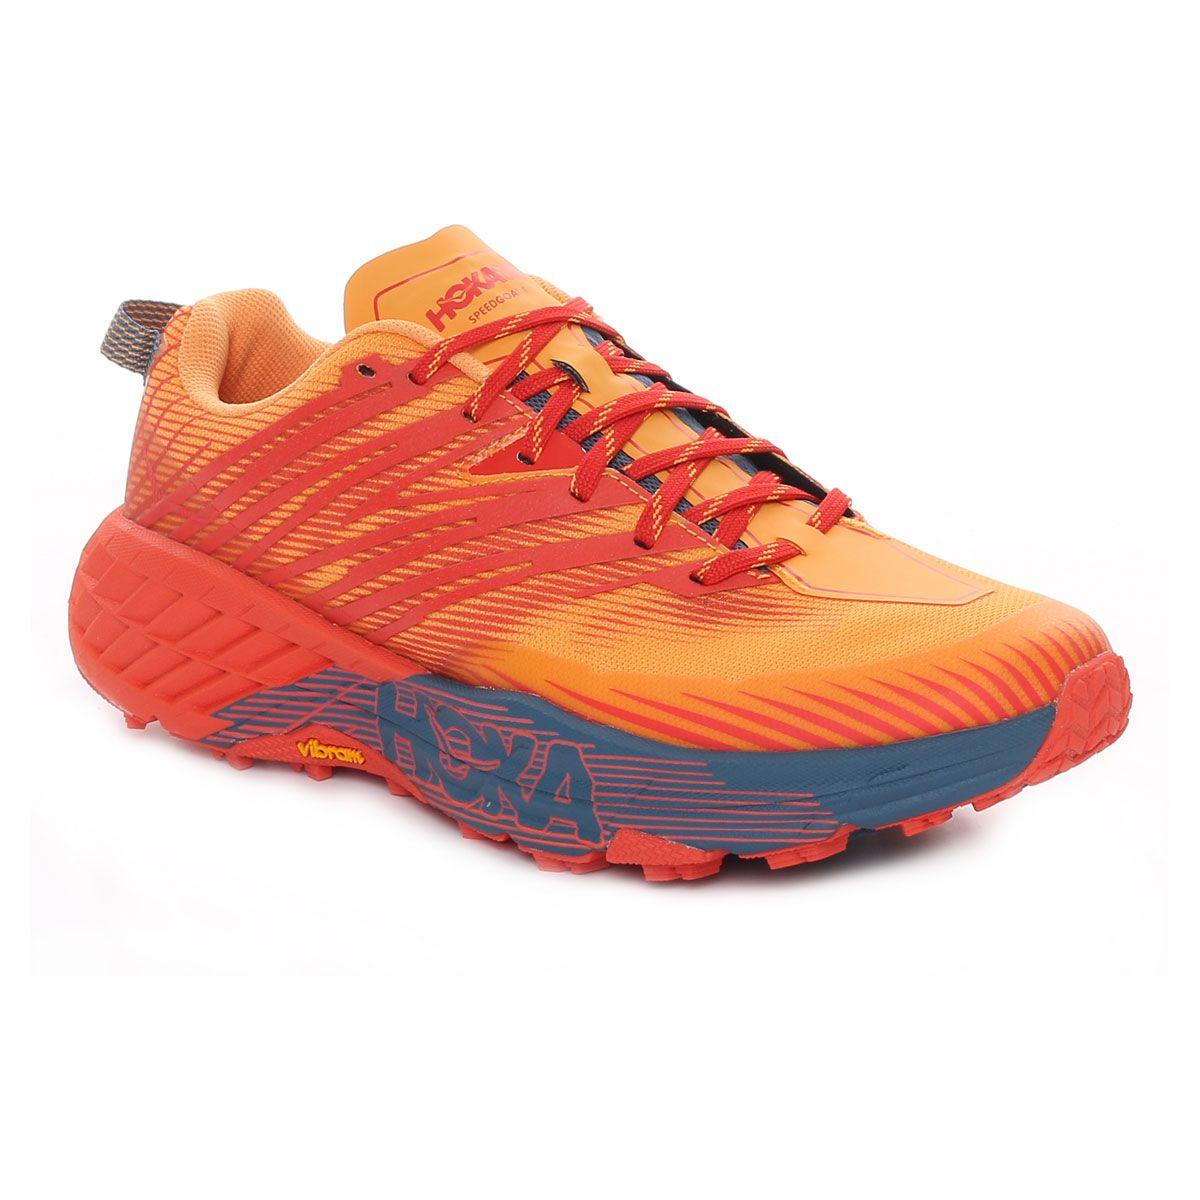 Hoka Speedgoat 4 Uomo Rosso Arancione